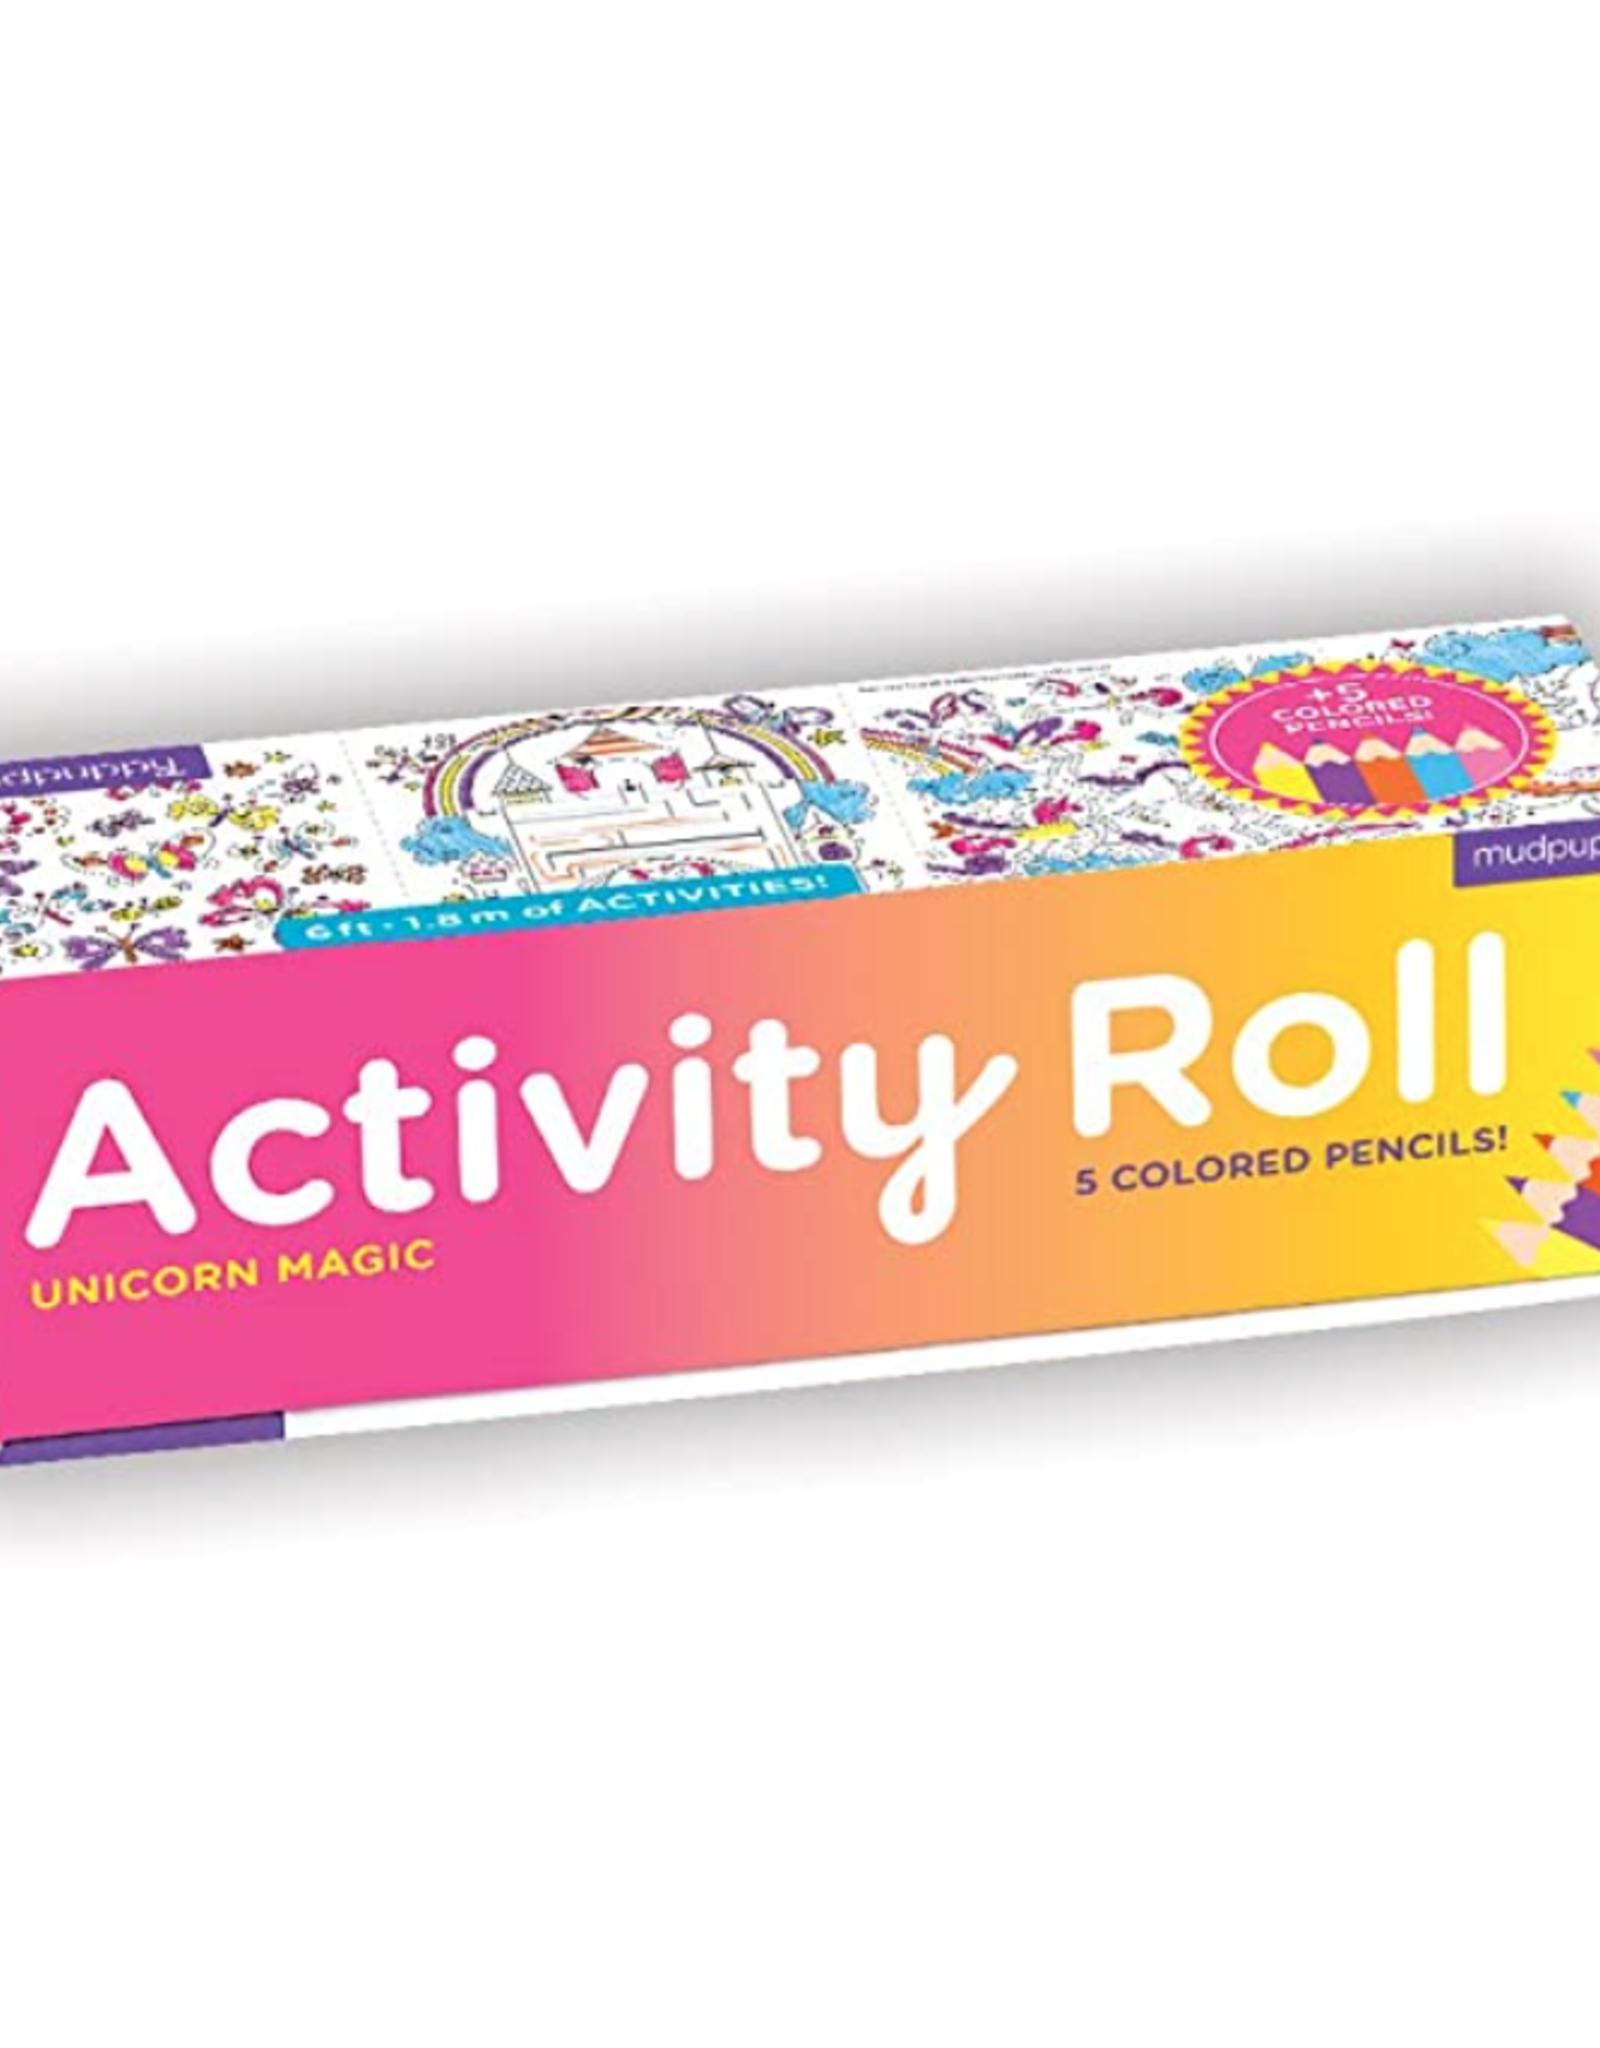 Chronicle Books Activity Roll: Unicorn Magic